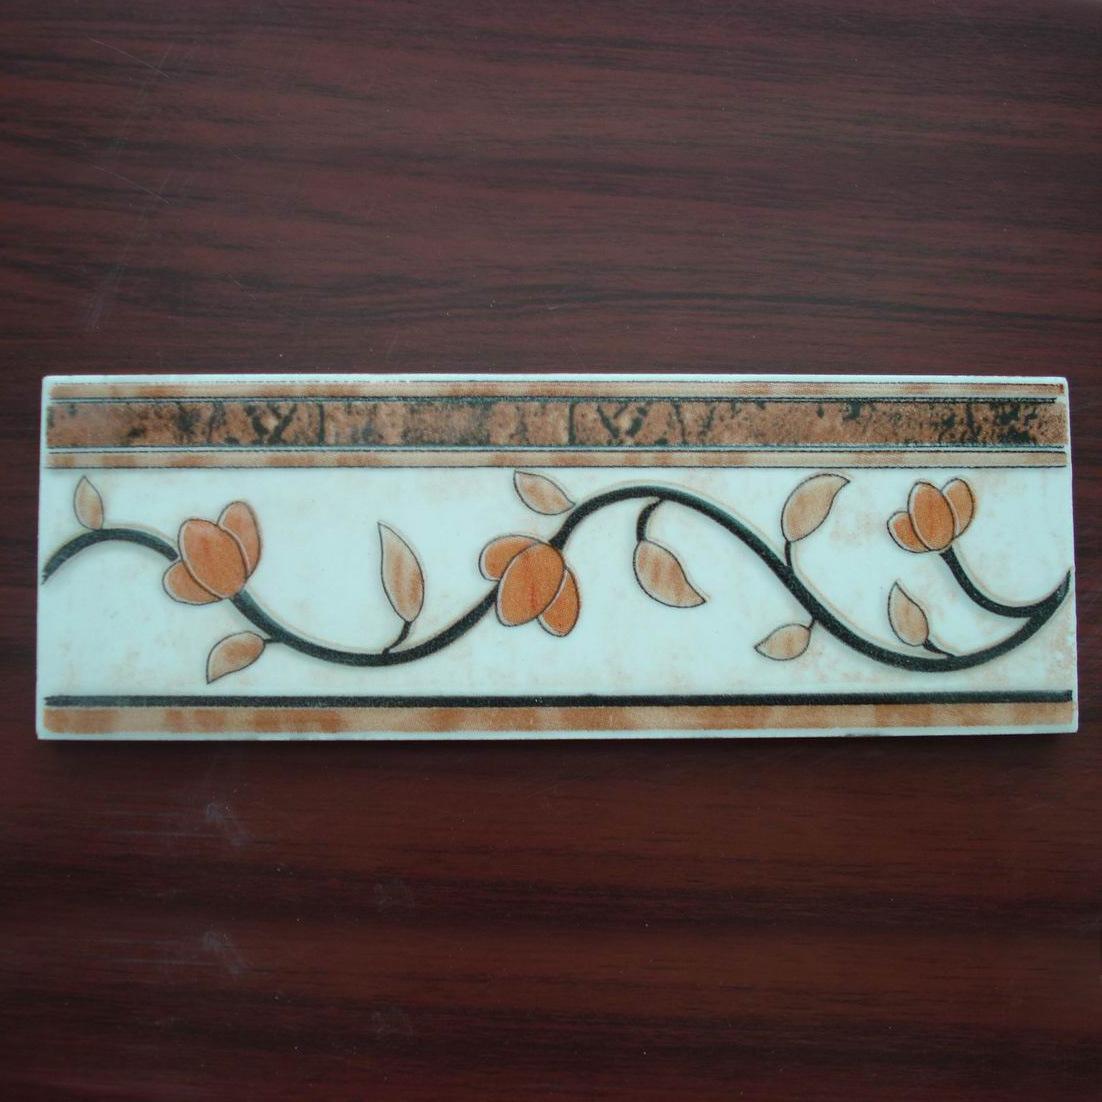 Ceramic tile border